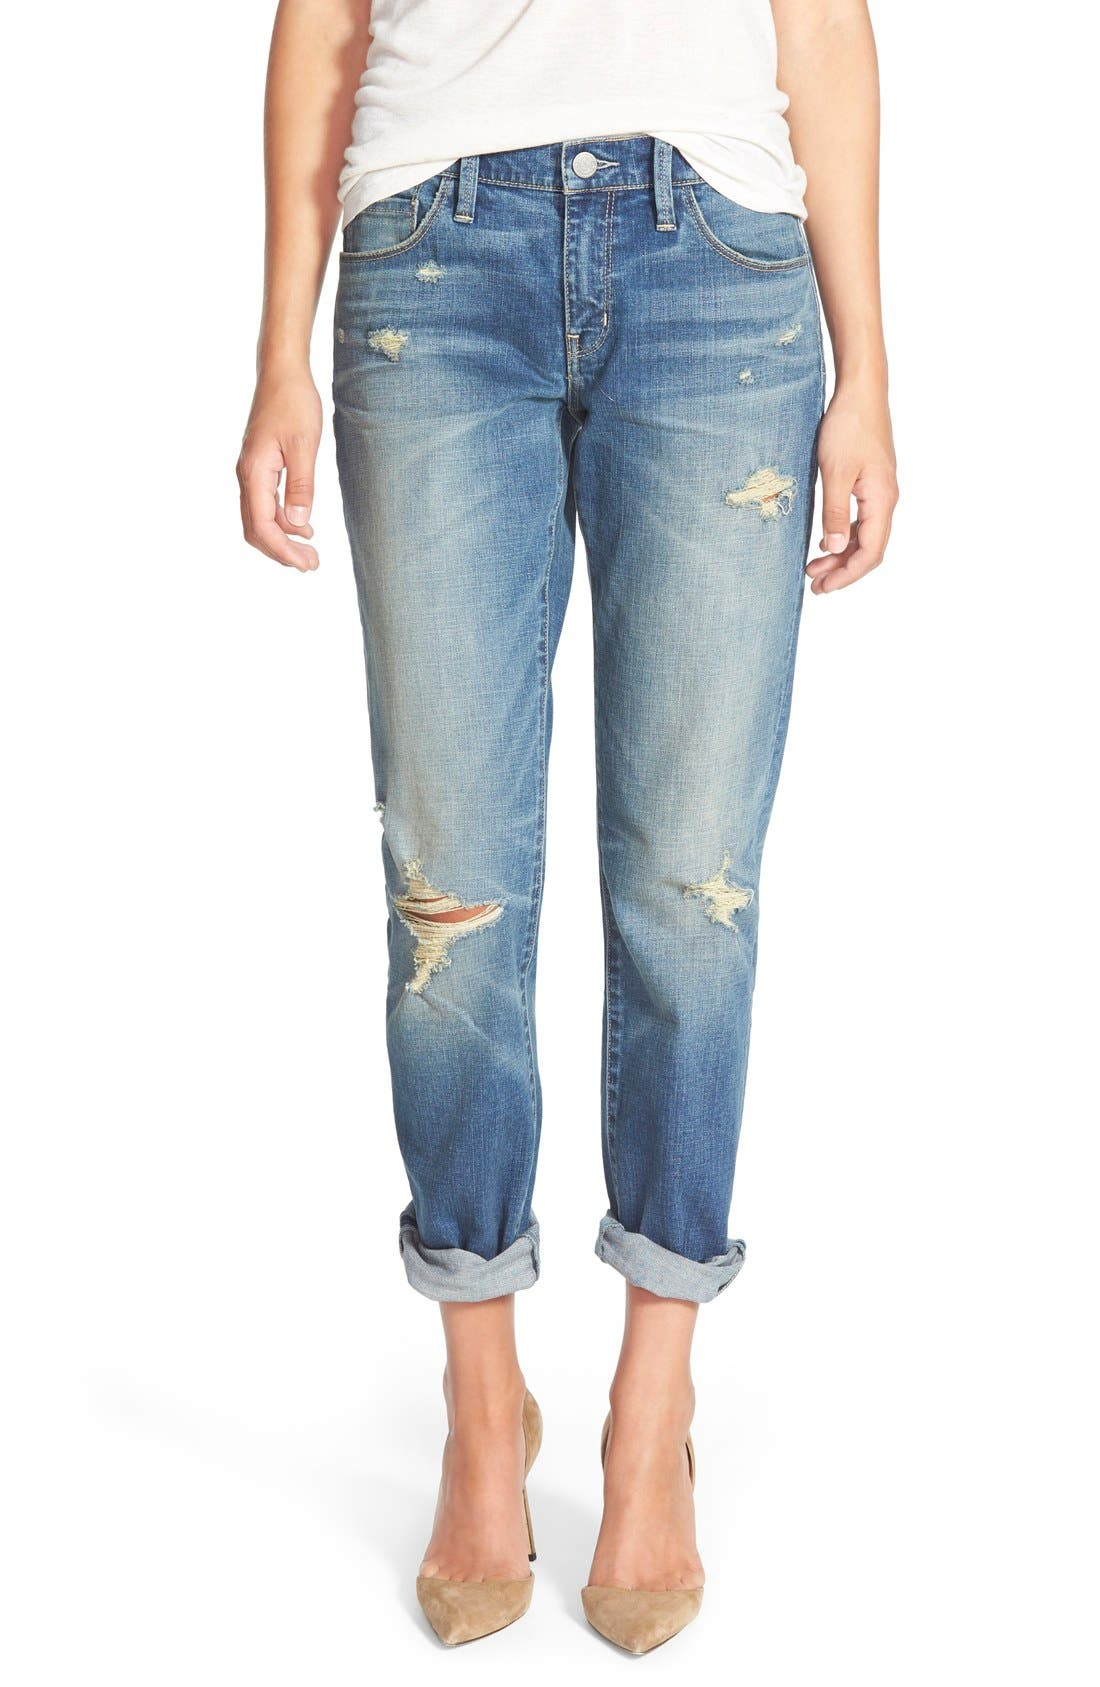 Treasure&Bond Boyfriend Jeans,                         Main,                         color, Cross Light Tint